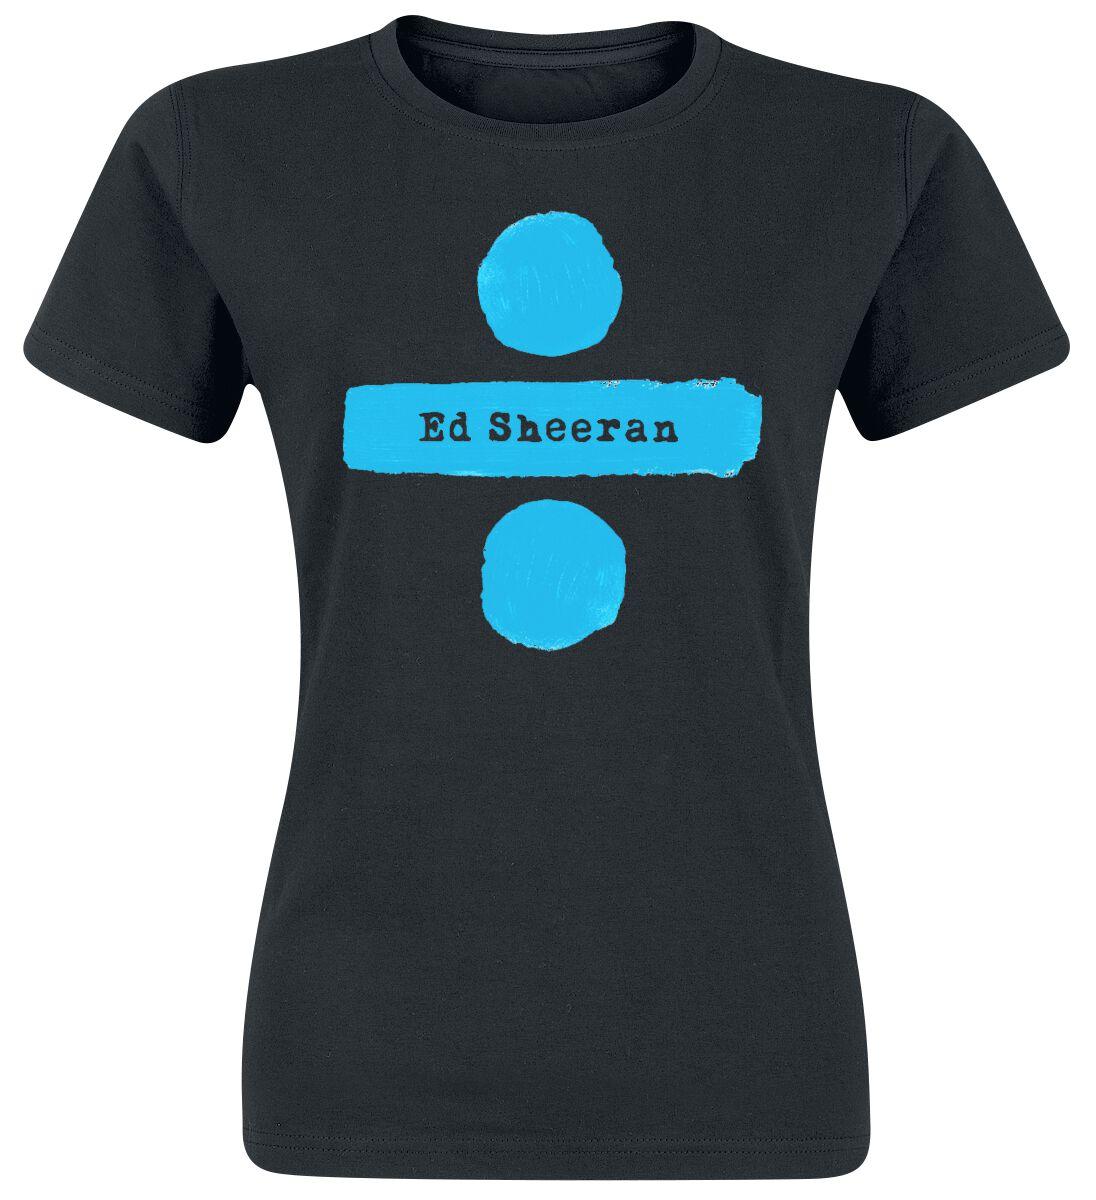 Zespoły - Koszulki - Koszulka damska Ed Sheeran Divide Logo Koszulka damska czarny - 351718